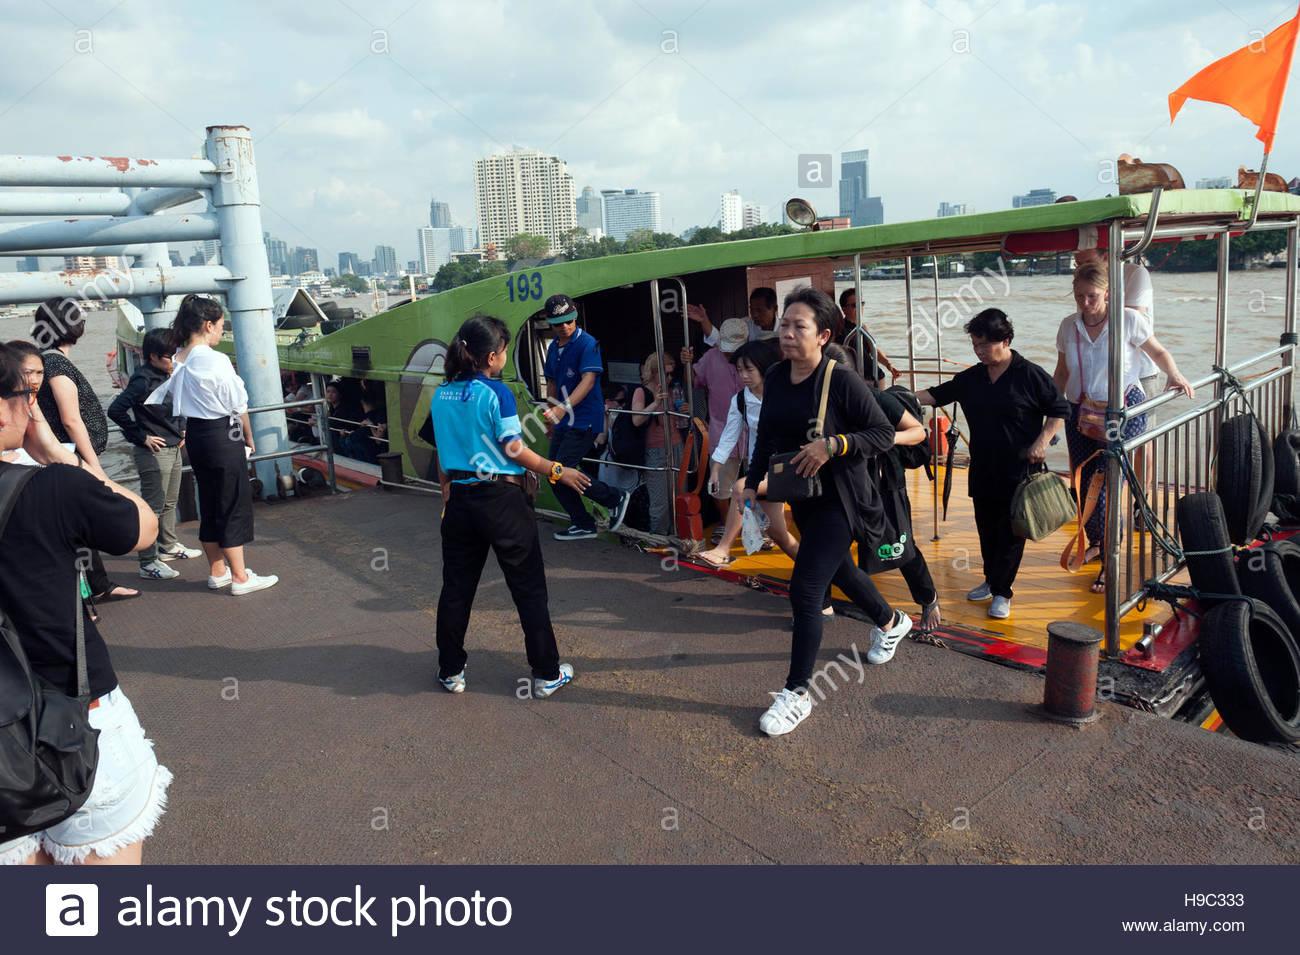 Bangkok Thailand Passenger boats on the Chao Phraya River. - Stock Image